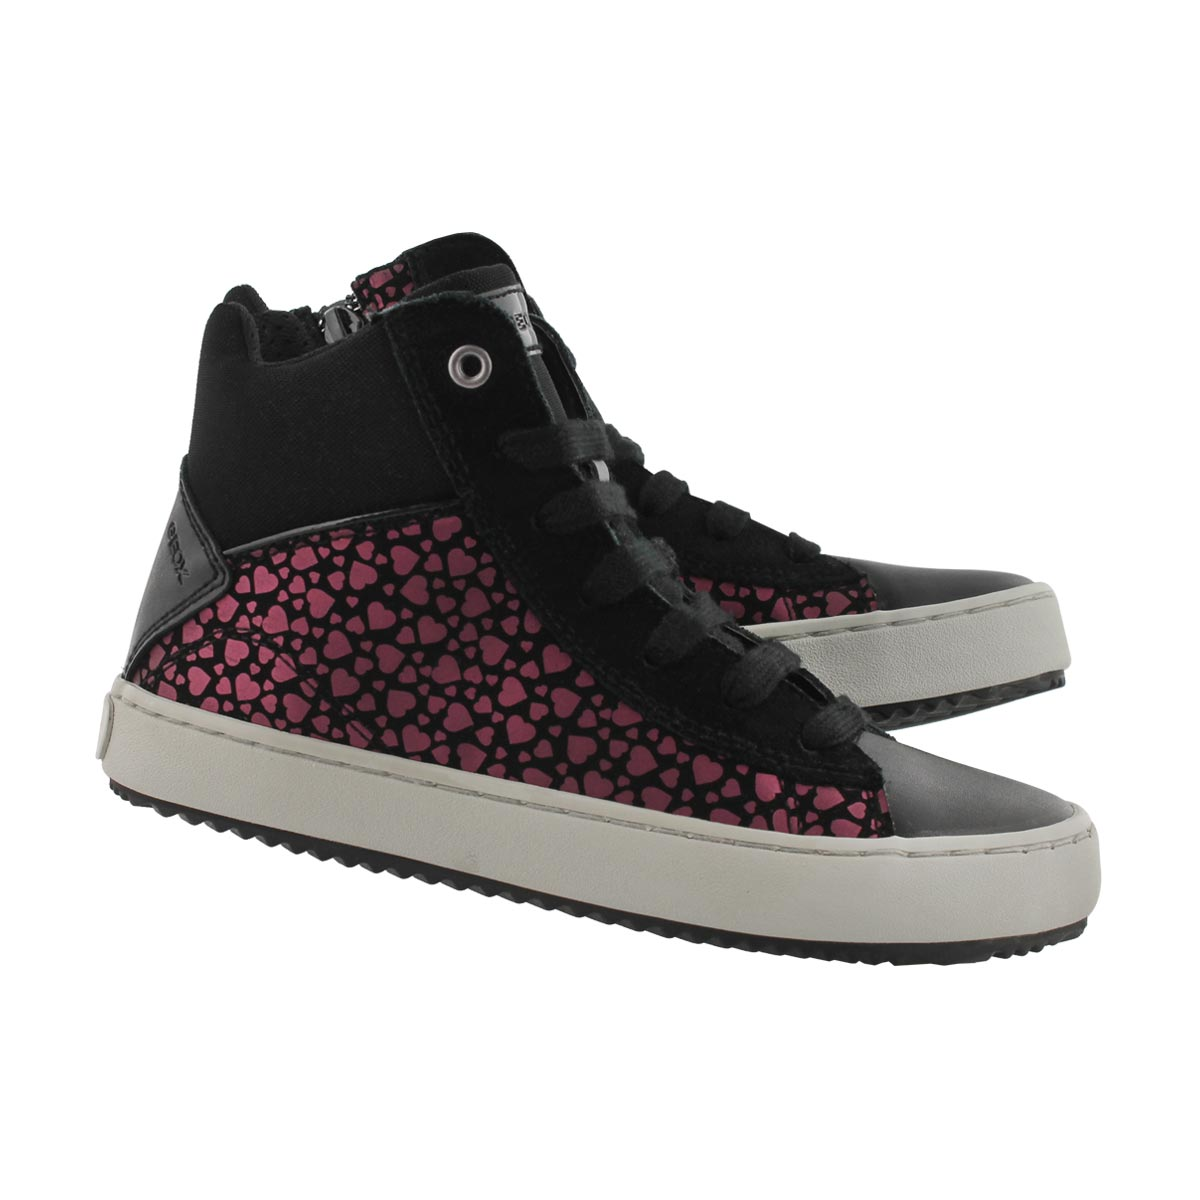 Grls Kalispera blk high top sneaker